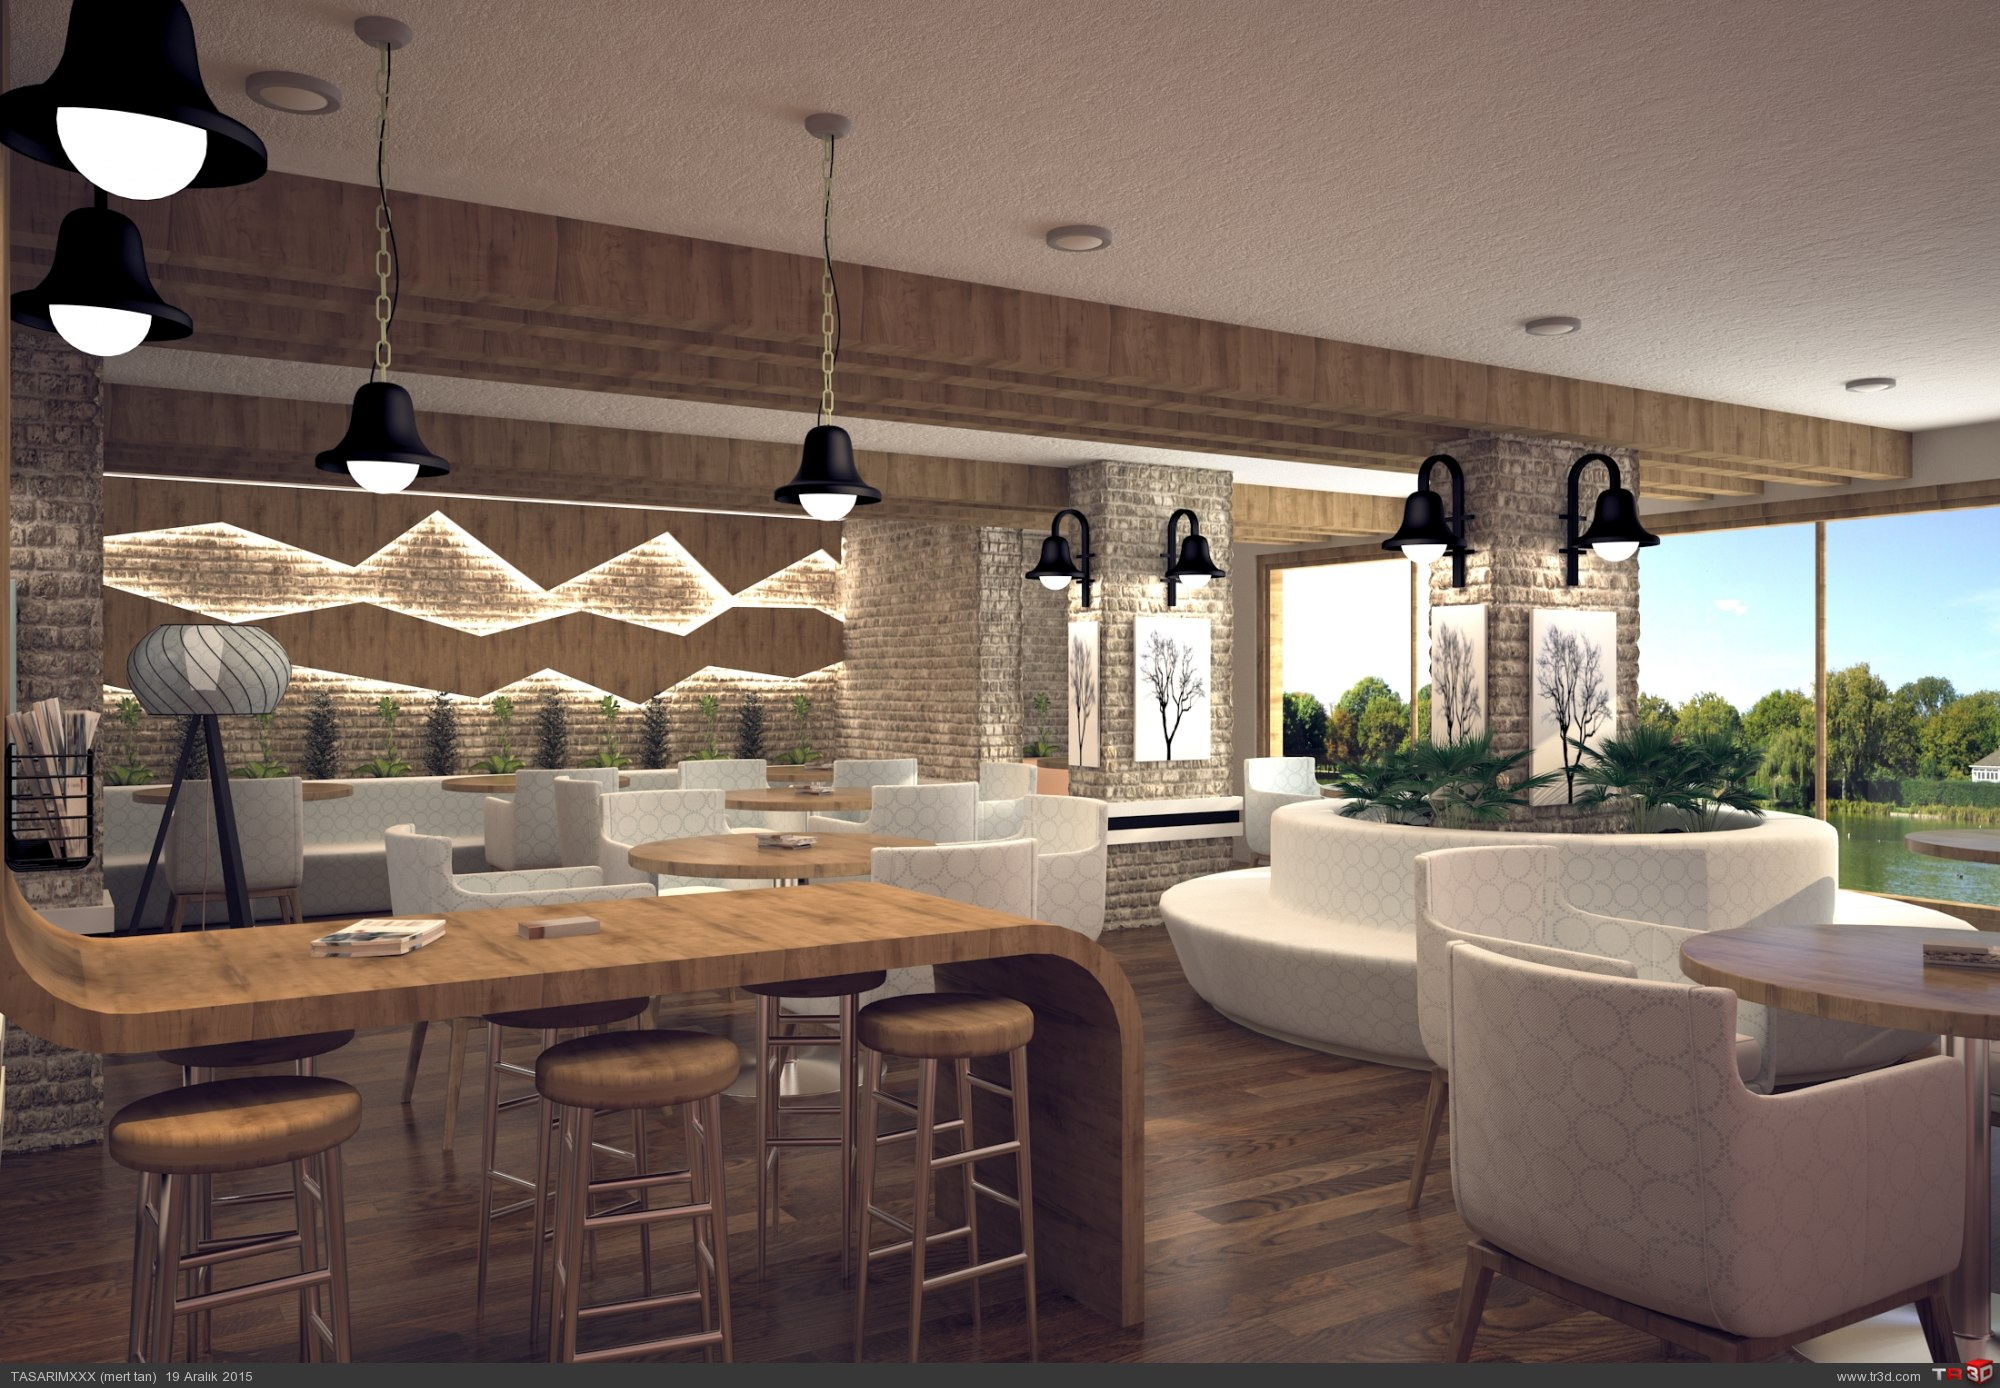 Cafe renderi 4